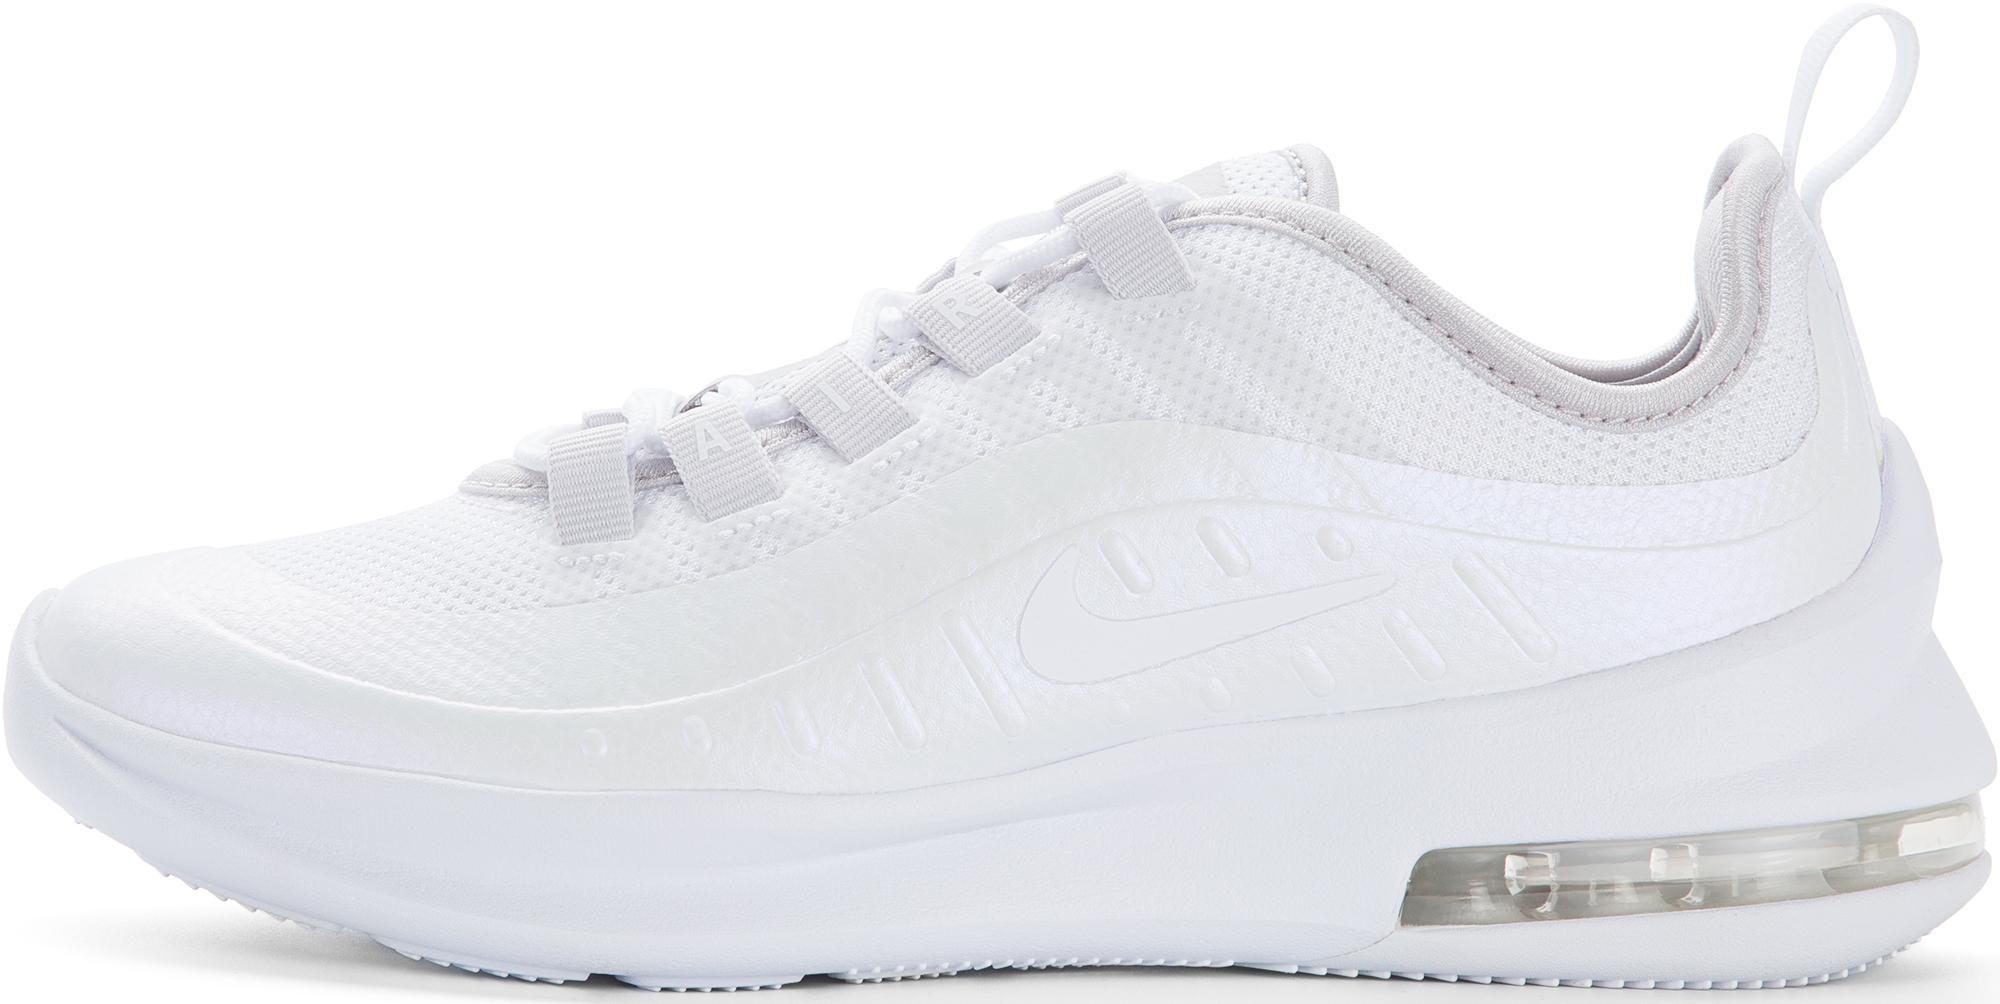 Nike Кроссовки для девочек Nike Air Max Axis, размер 39